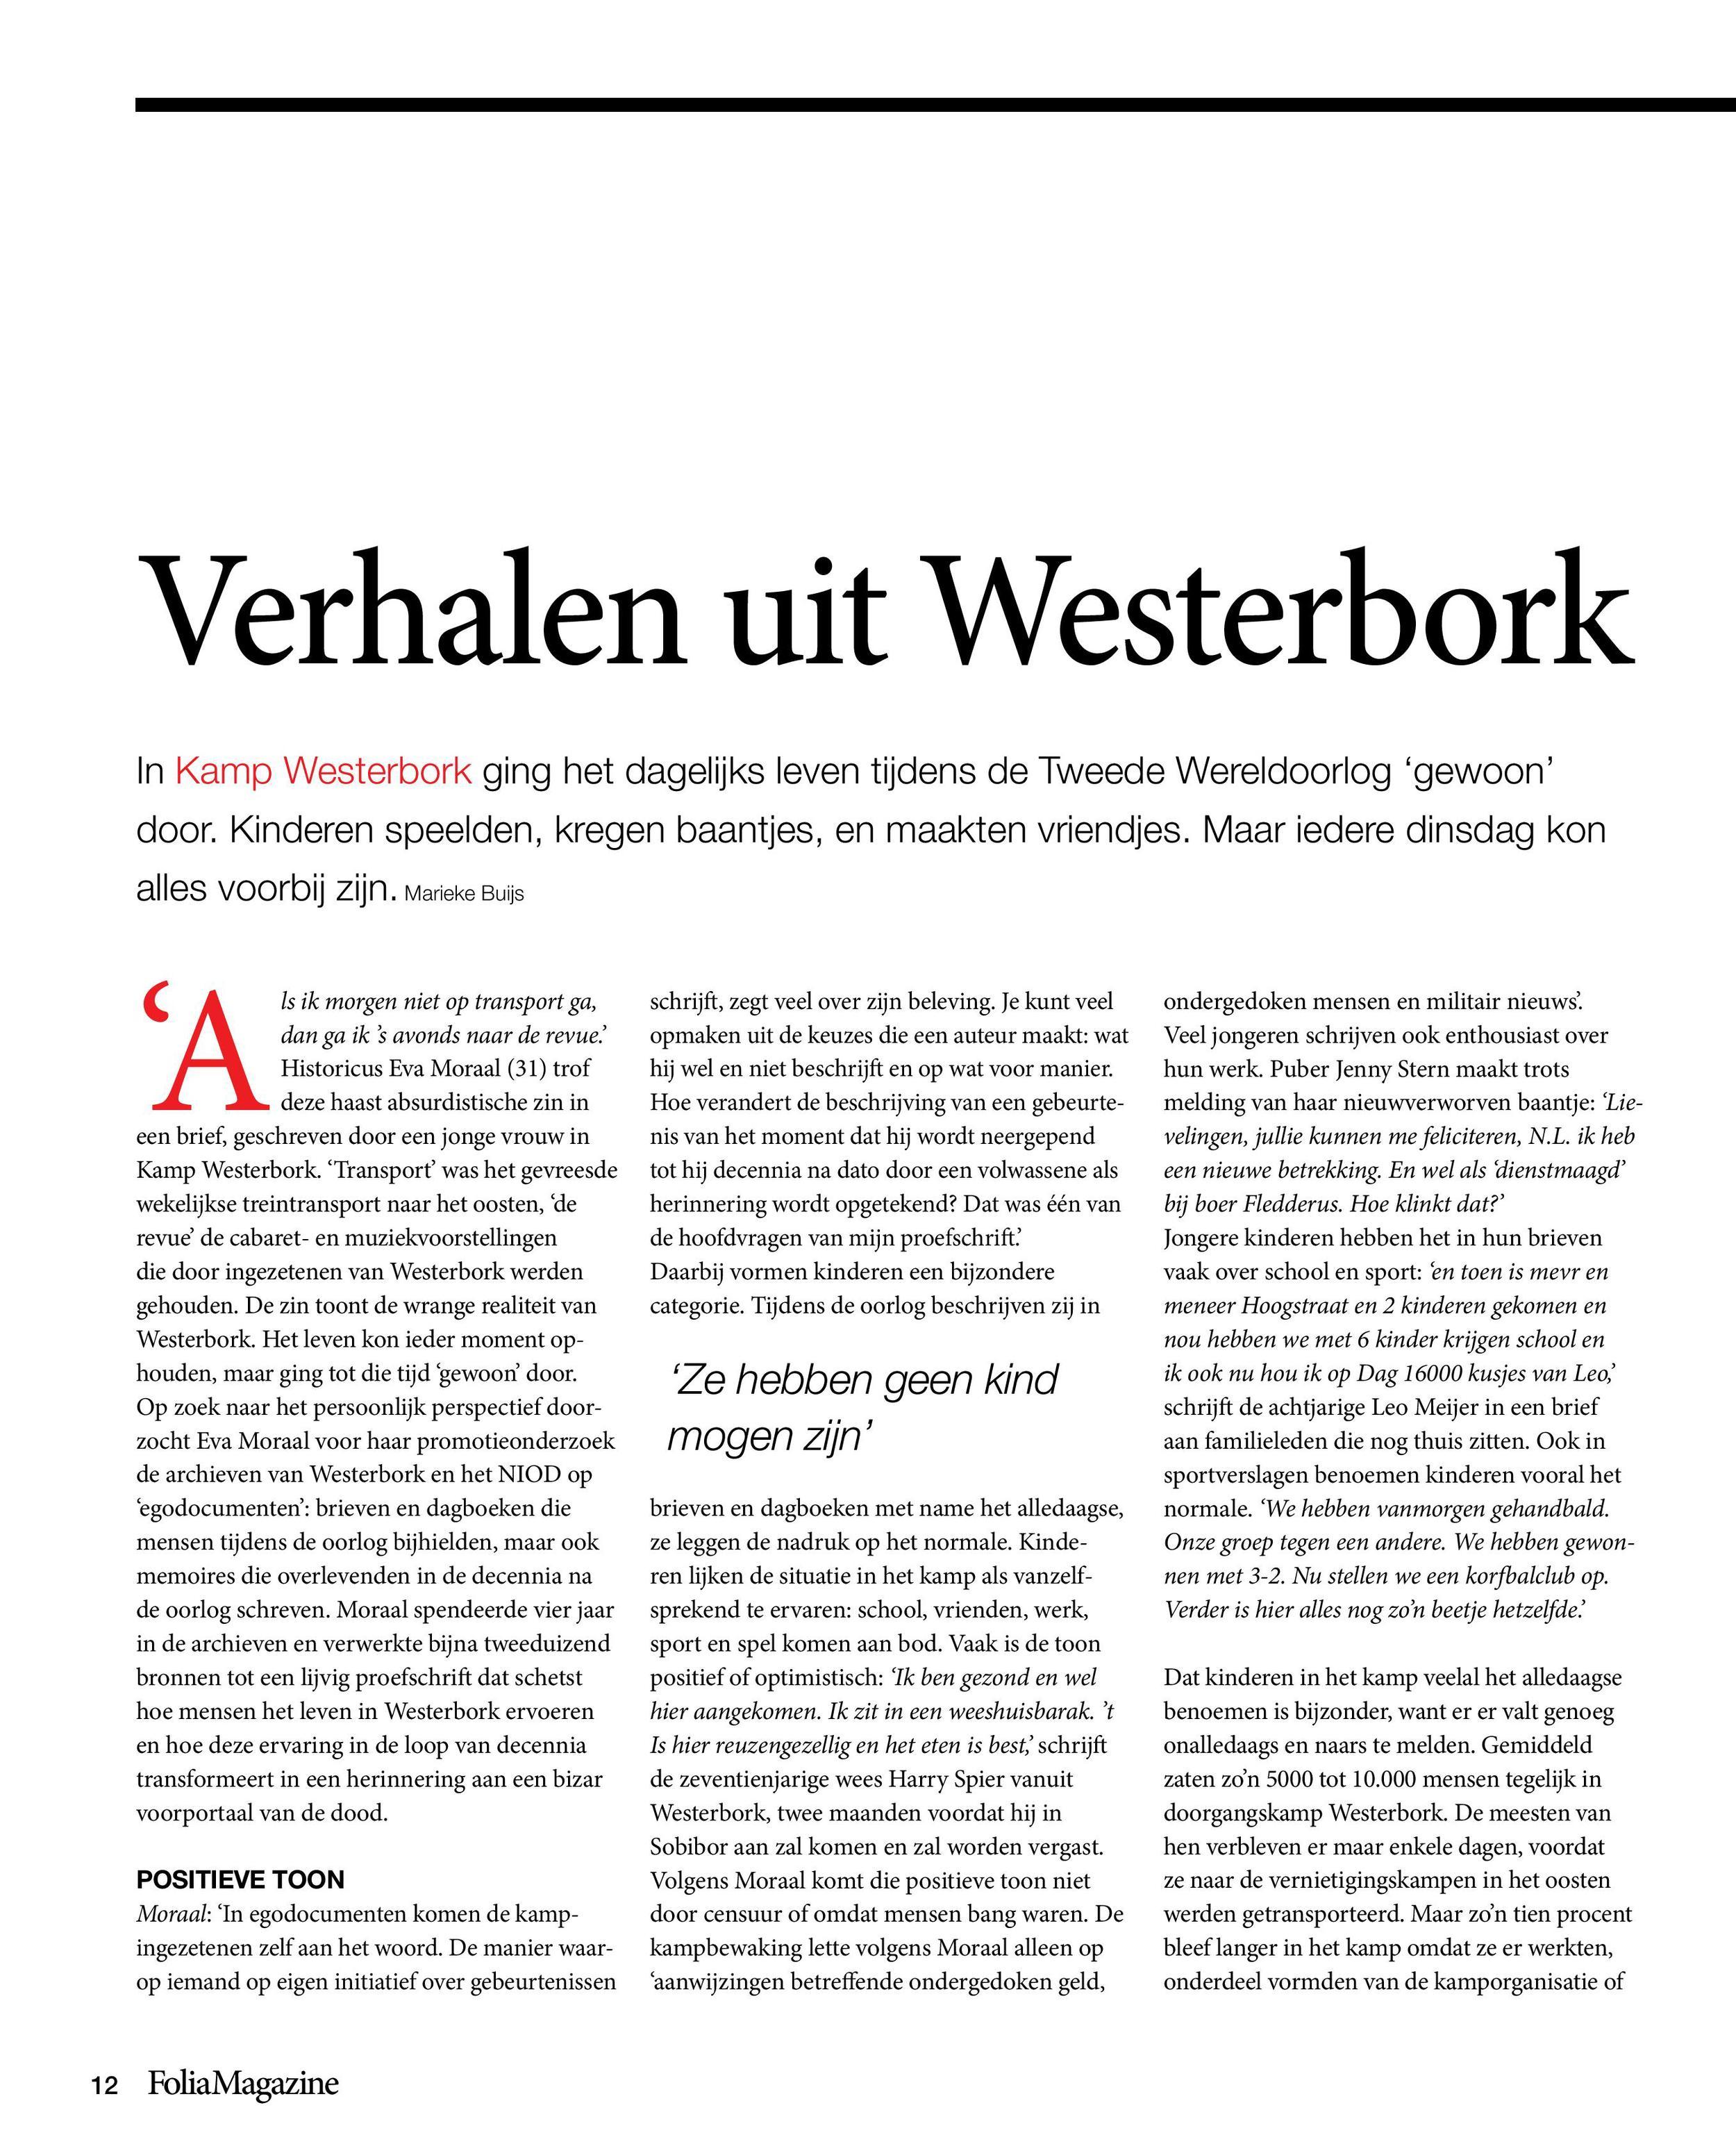 Verhalen uit Westerbork-page-001.jpg